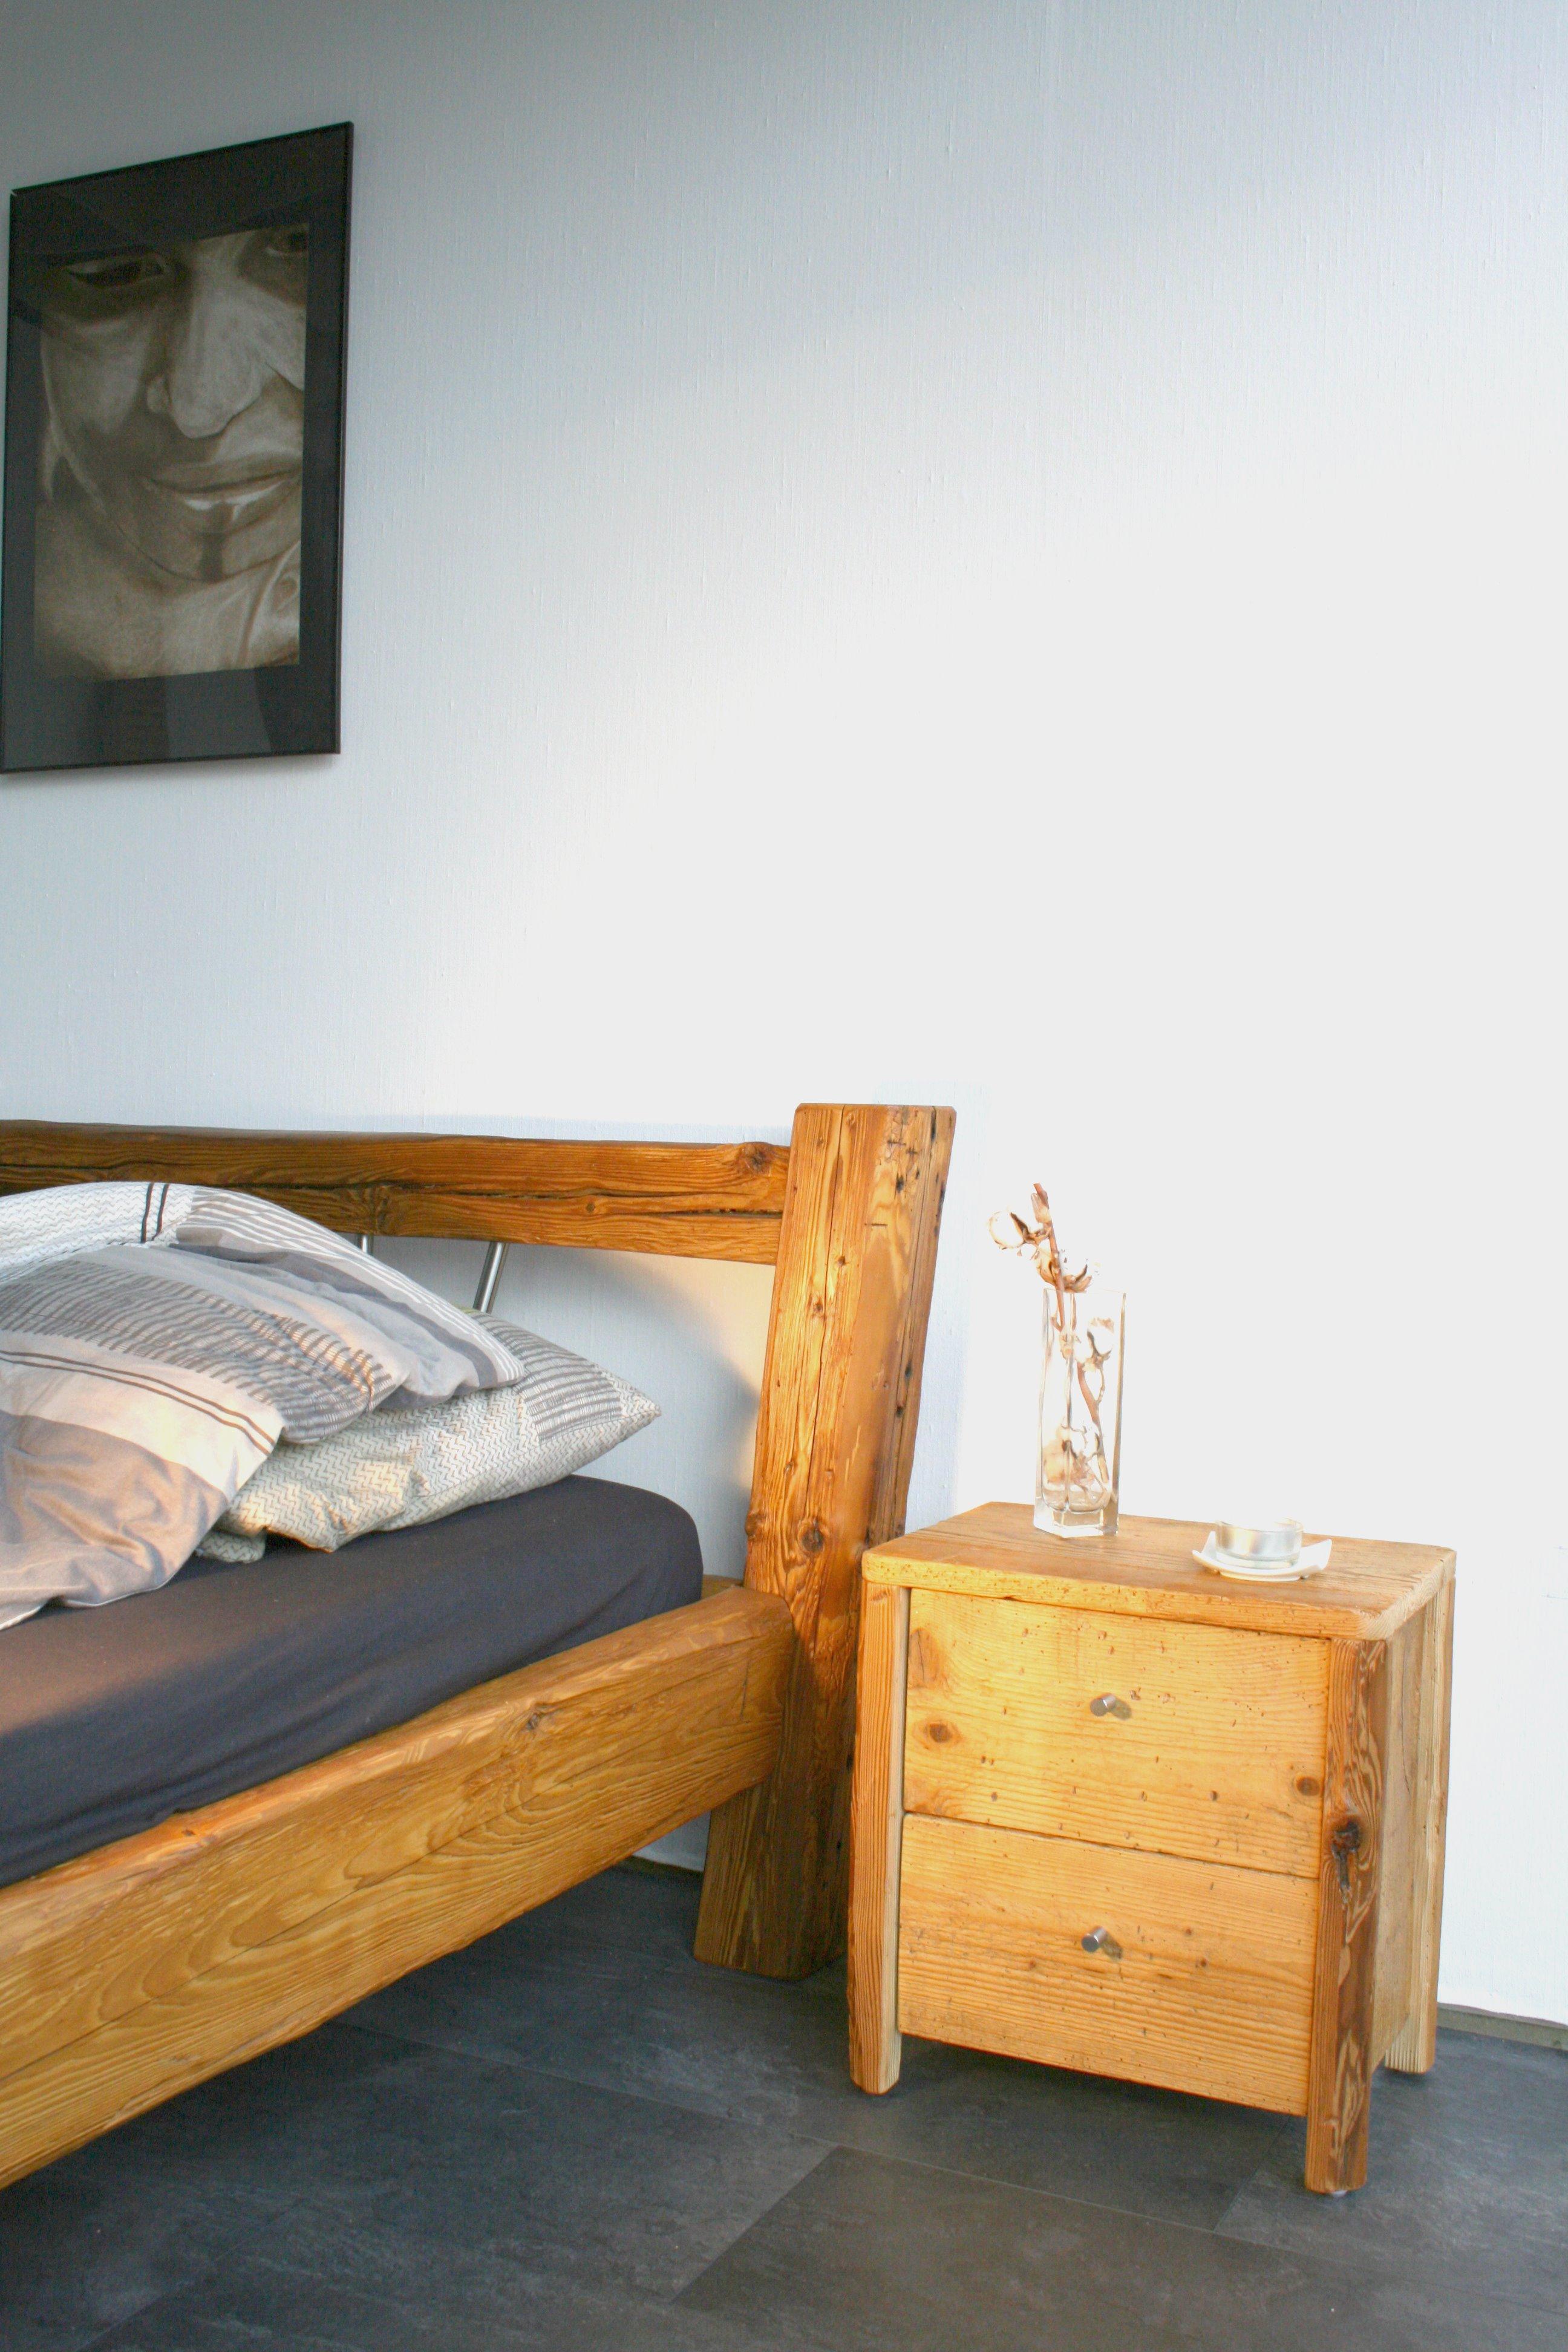 wandtisch bilder ideen couchstyle. Black Bedroom Furniture Sets. Home Design Ideas